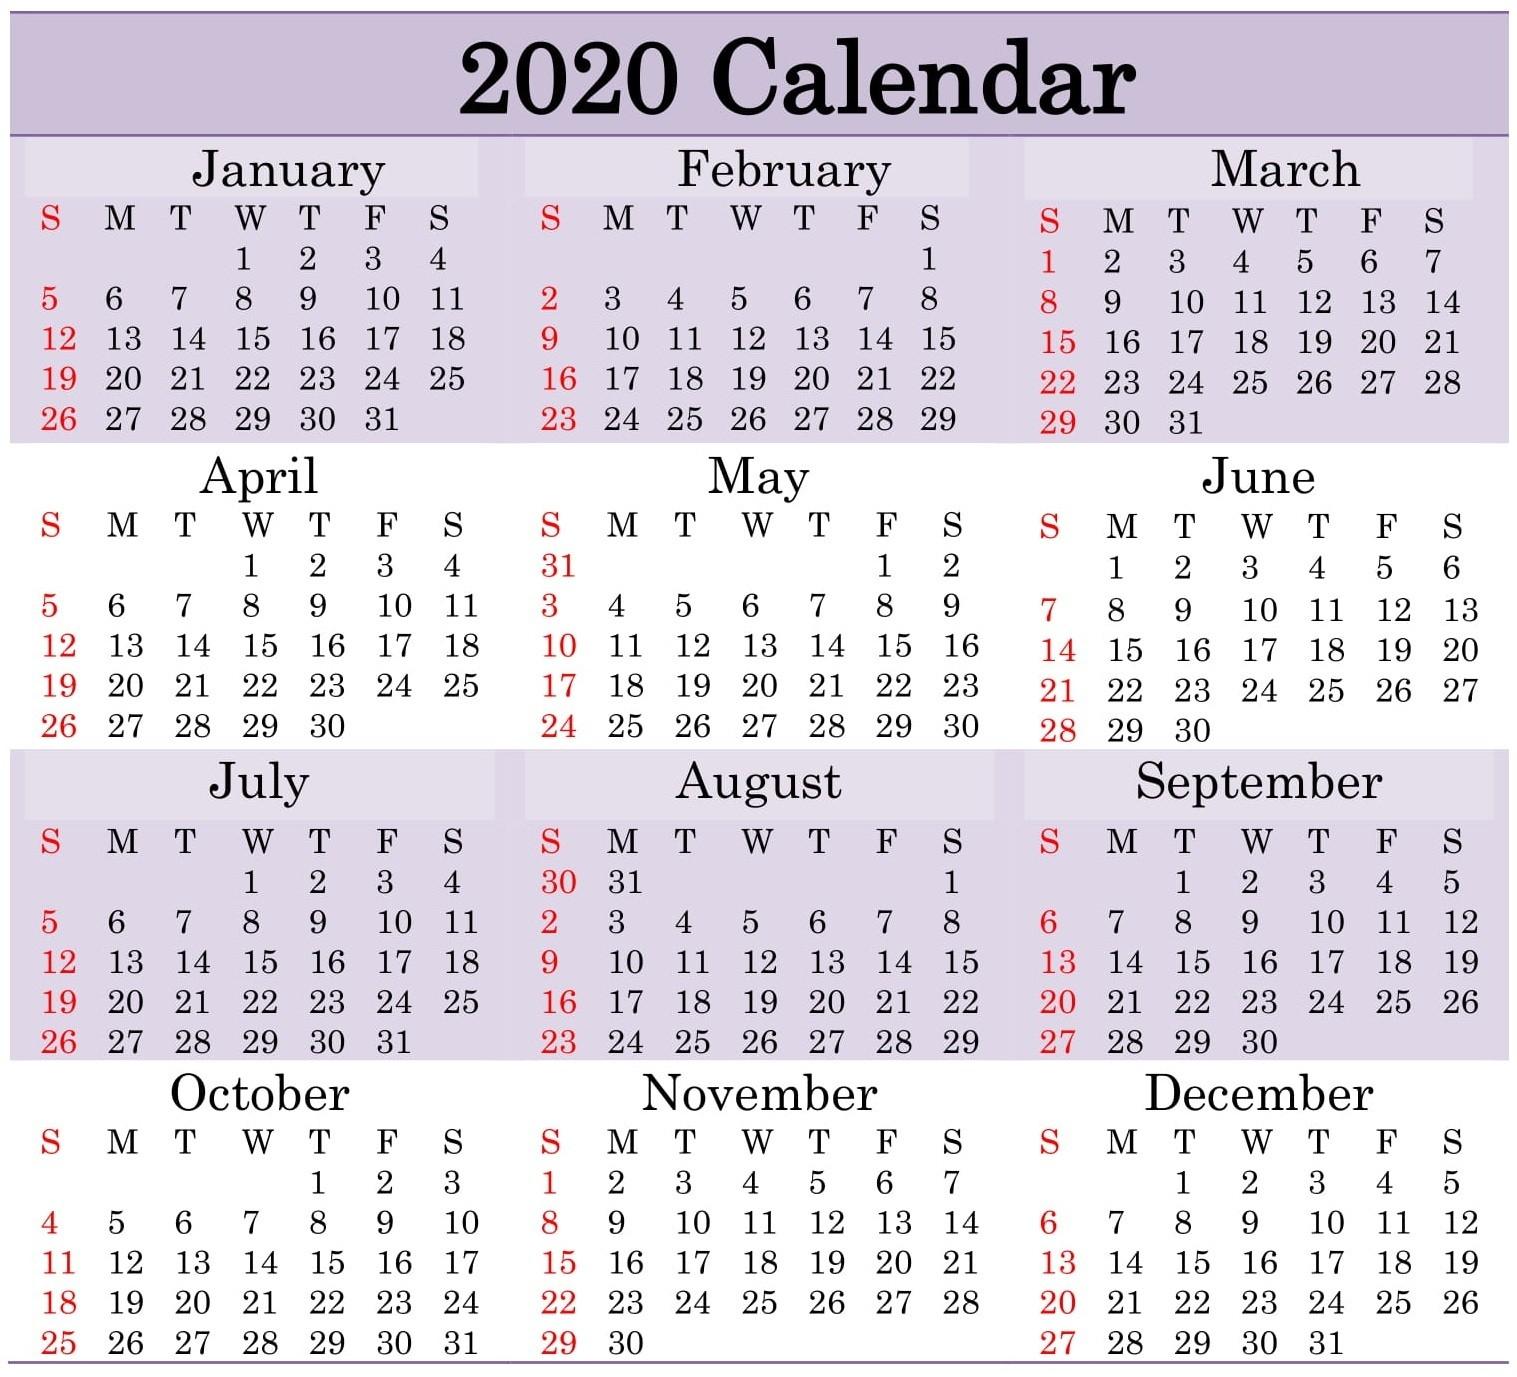 Printable 2020 Calendar Word Document - Latest Printable  Julian Day Calendar 2020